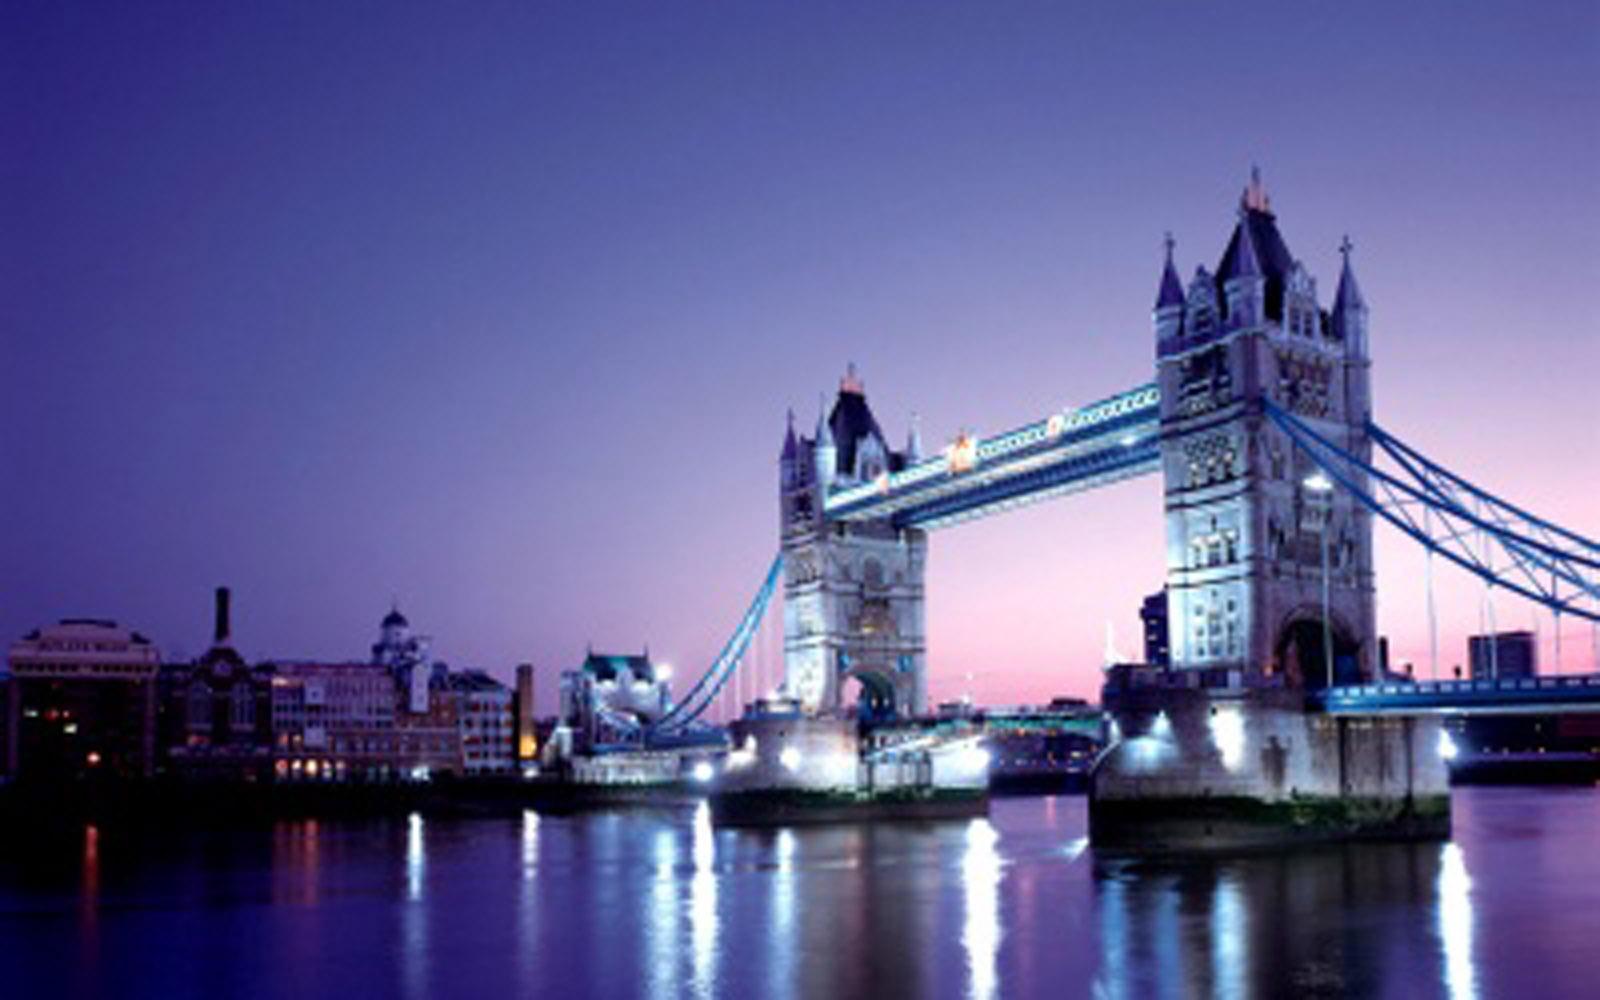 pictures of london bridge 2013 wallpapers